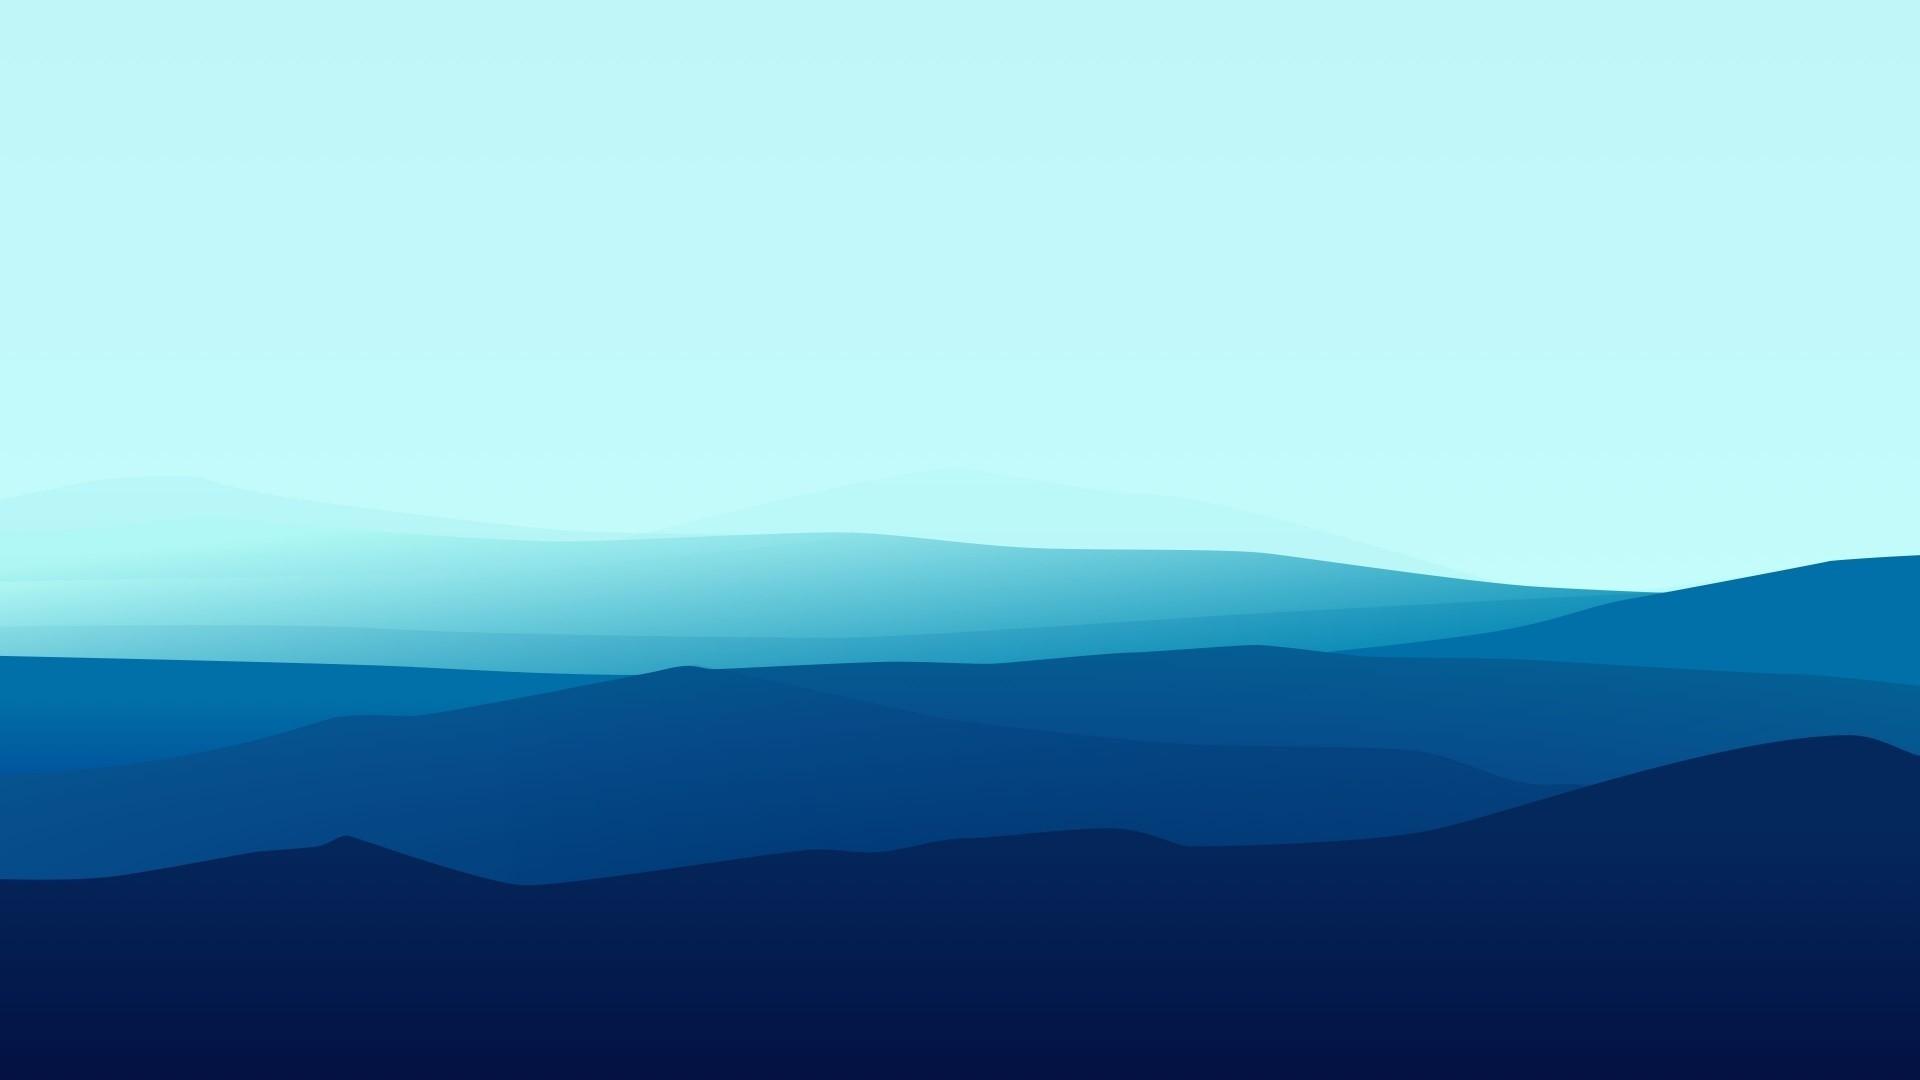 Water Minimalist Wallpaper for pc